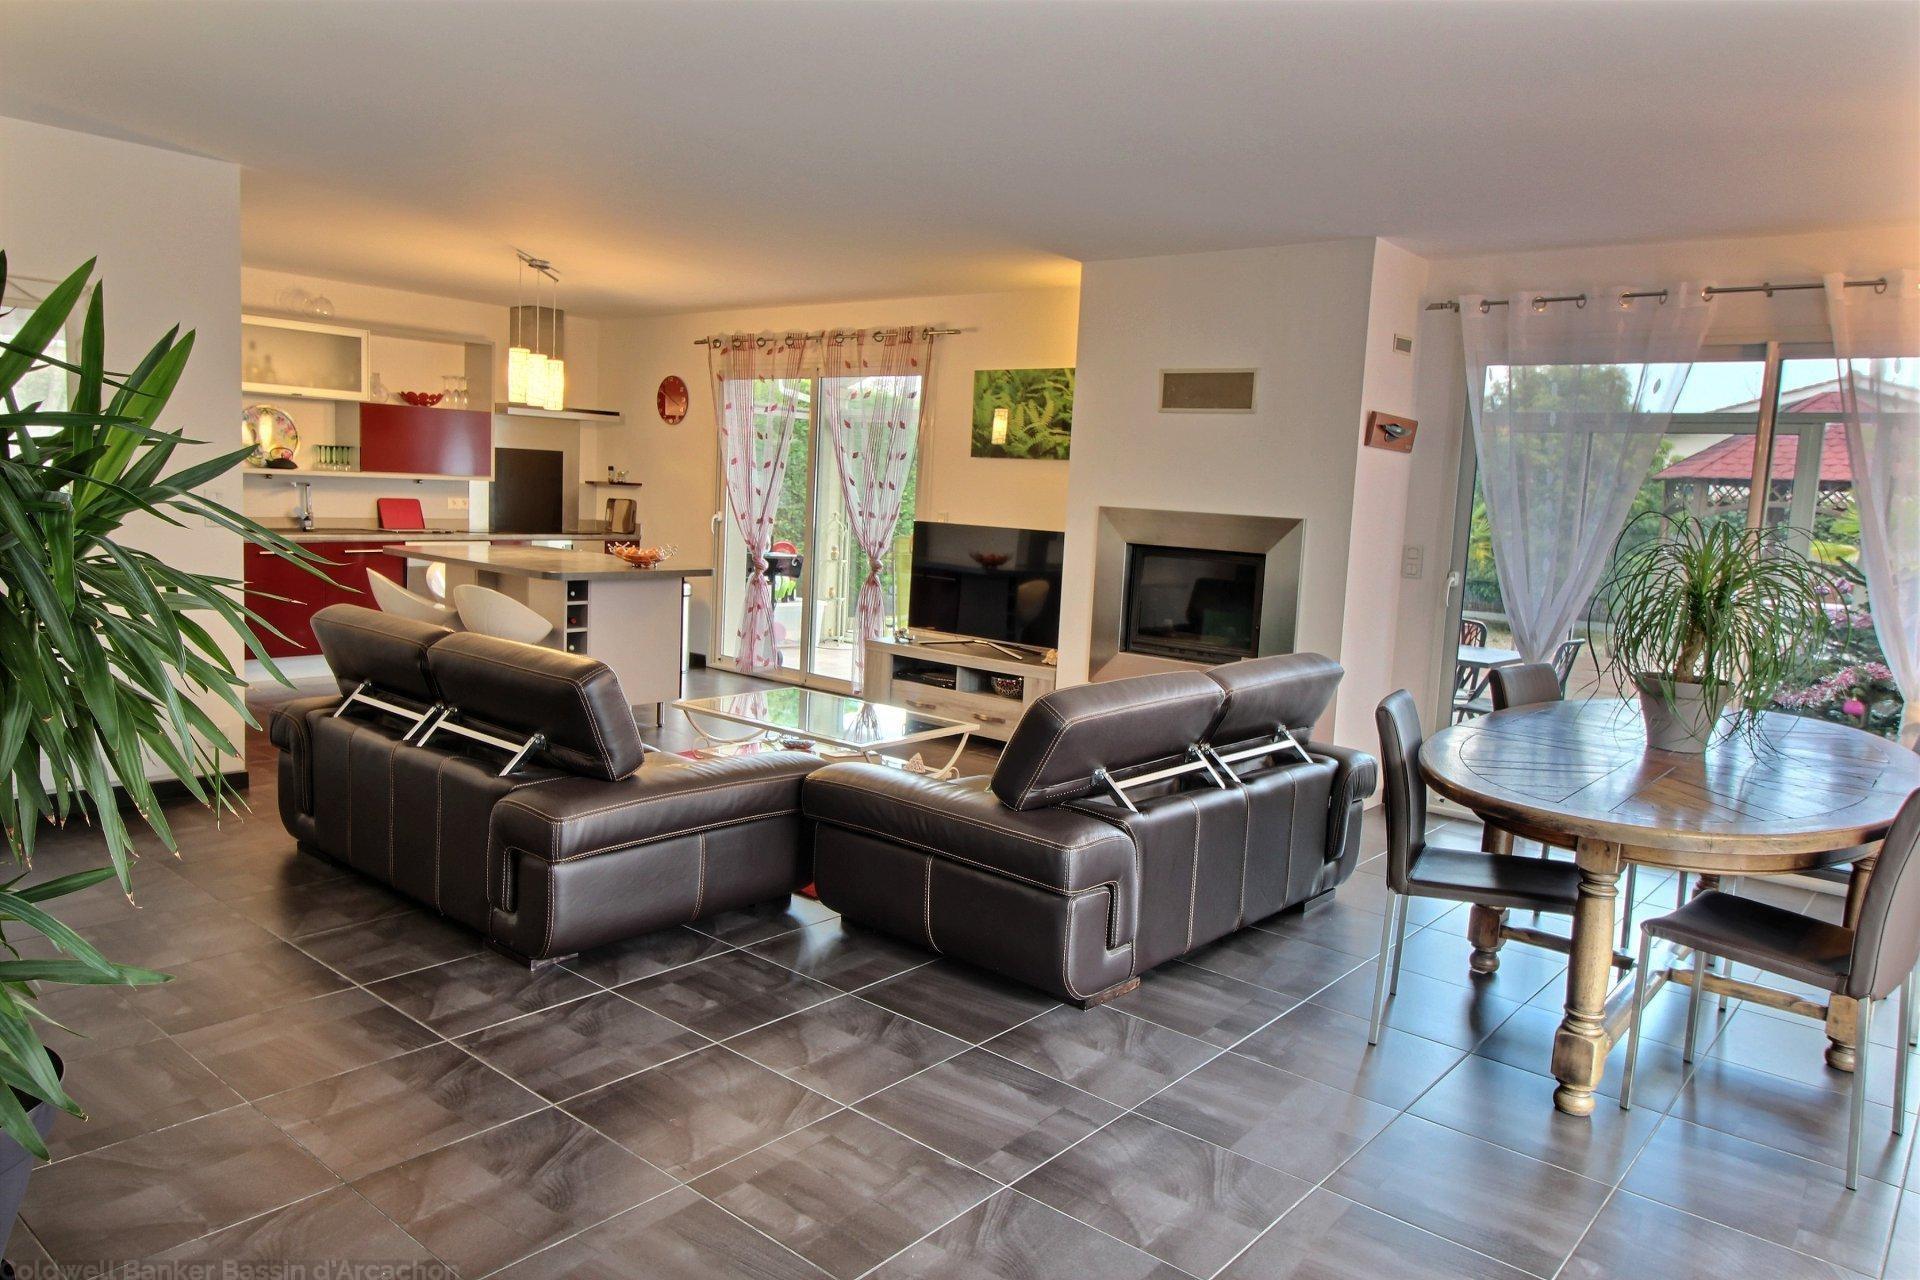 Vente maison contemporaine 4 chambres bassin d arcachon gujan mestras